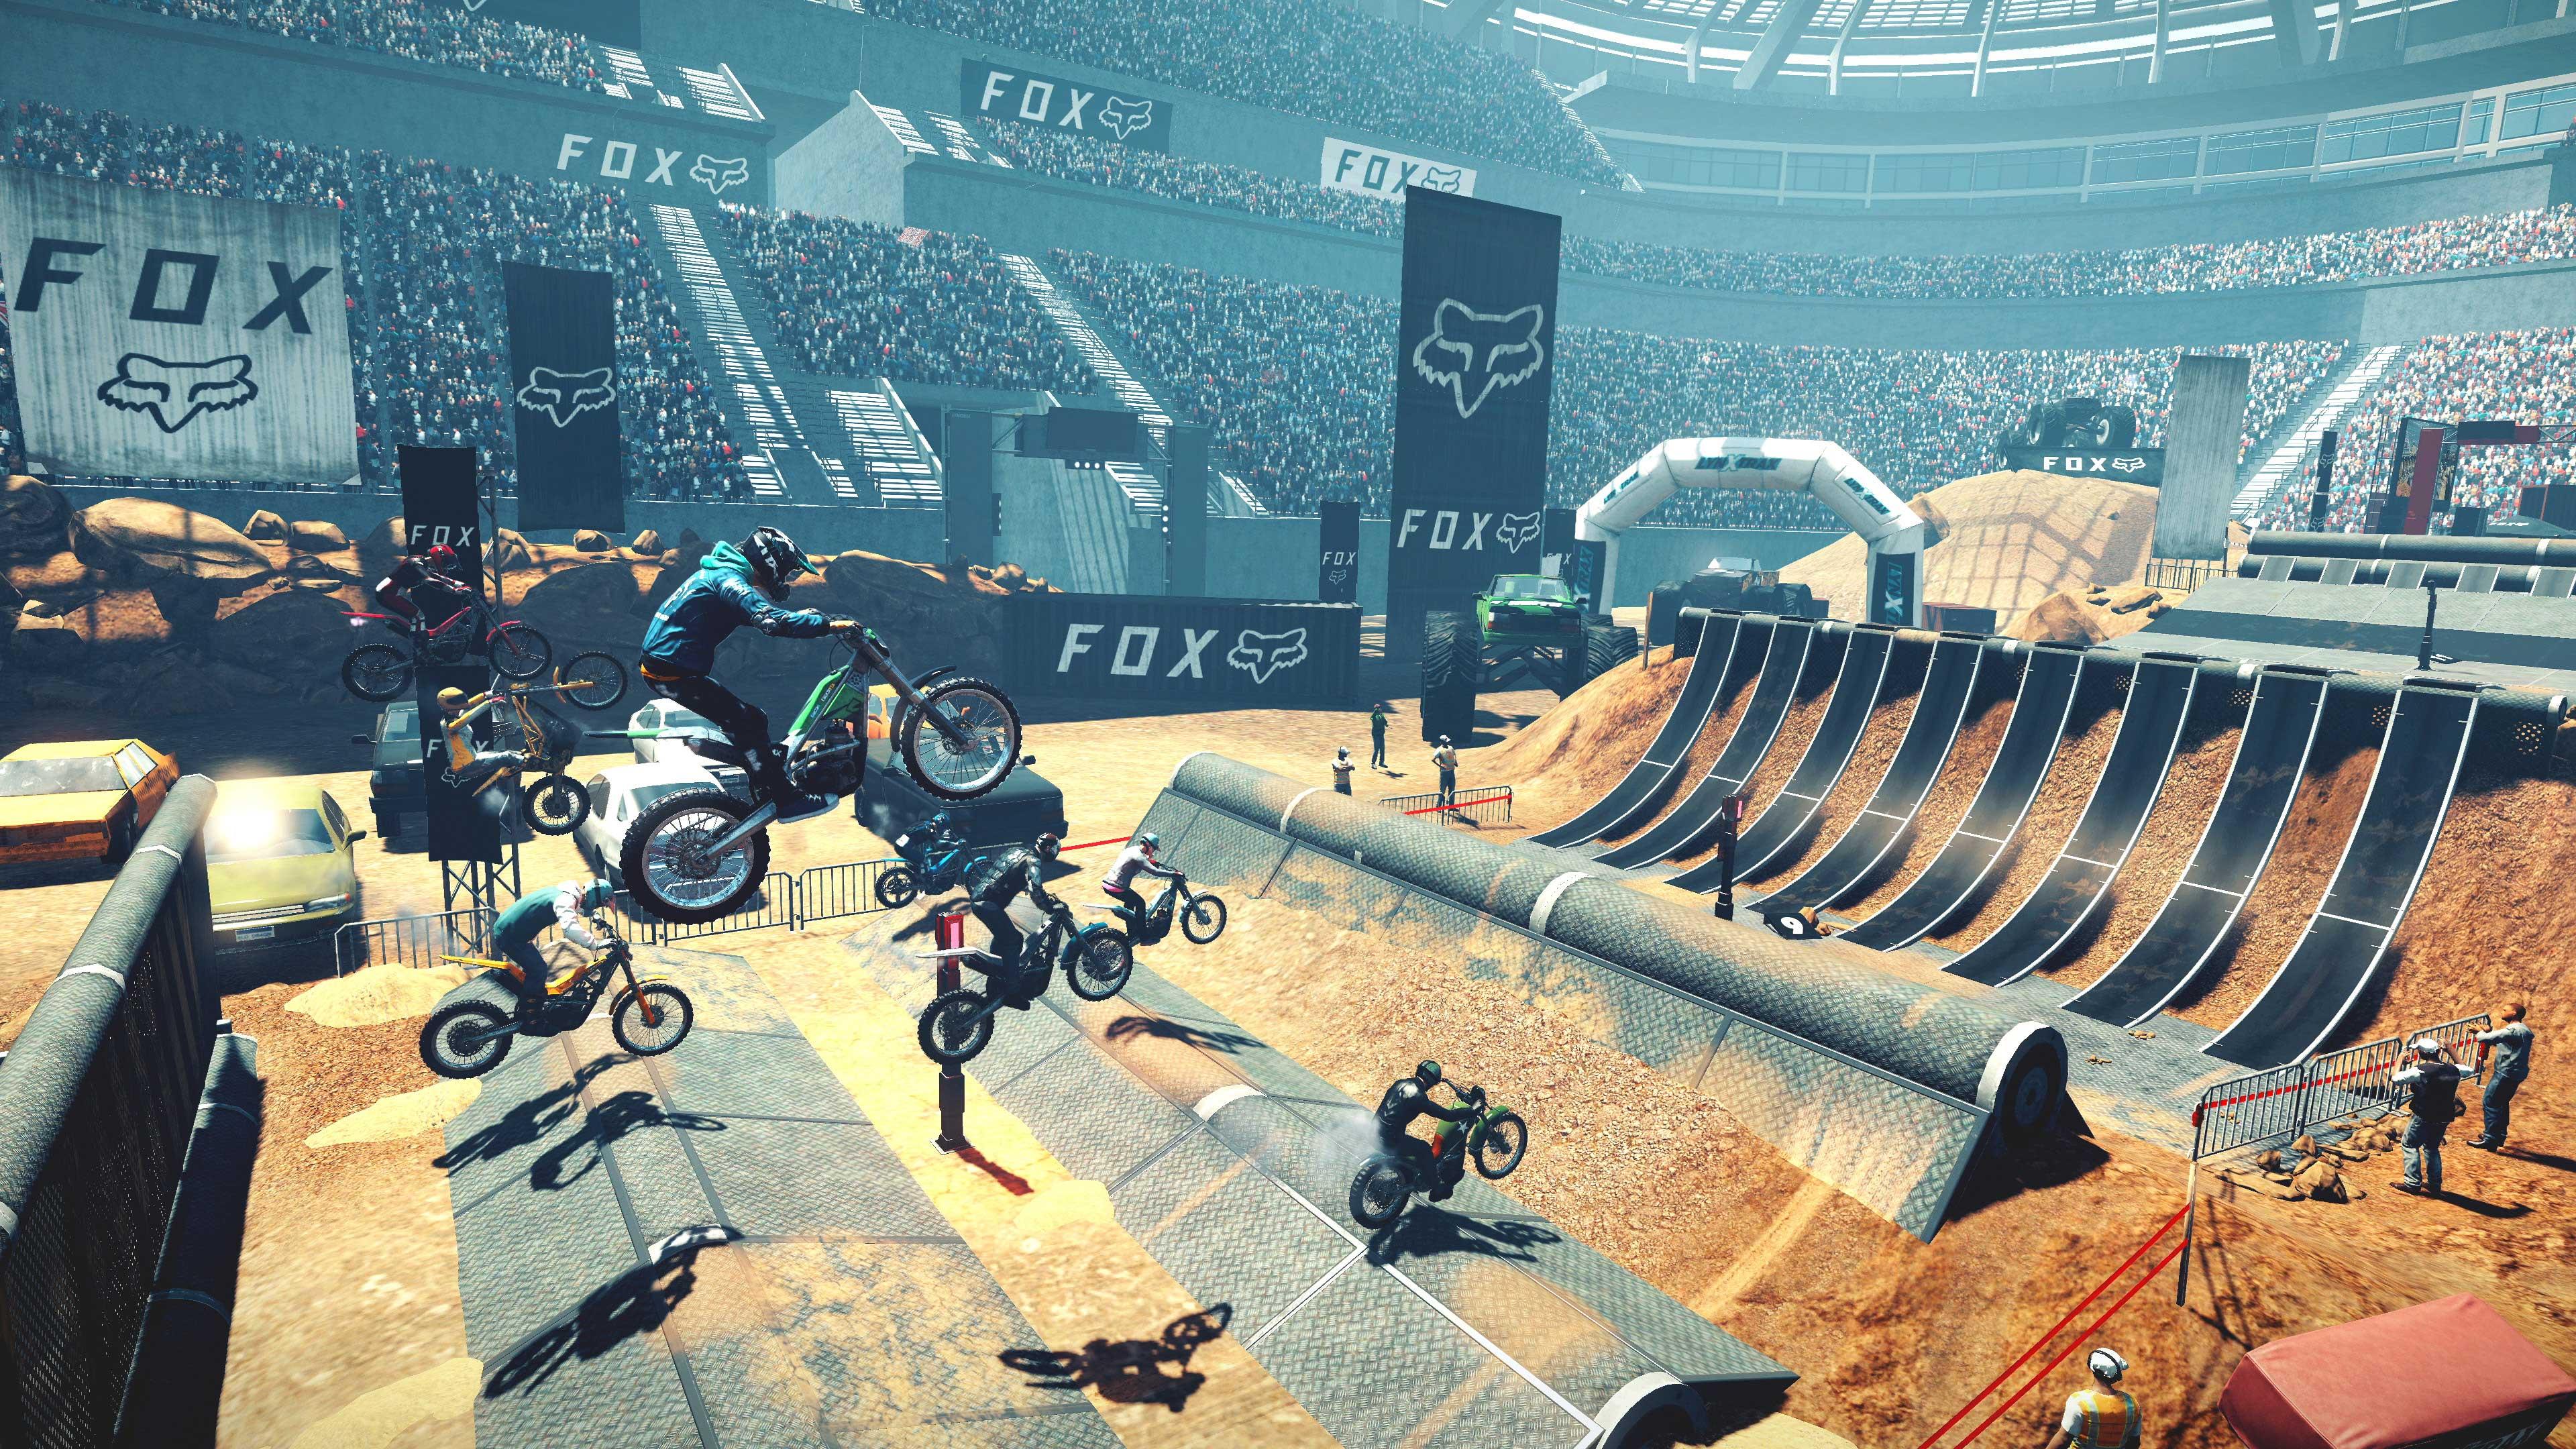 trials rising video game hd wallpaper 67164